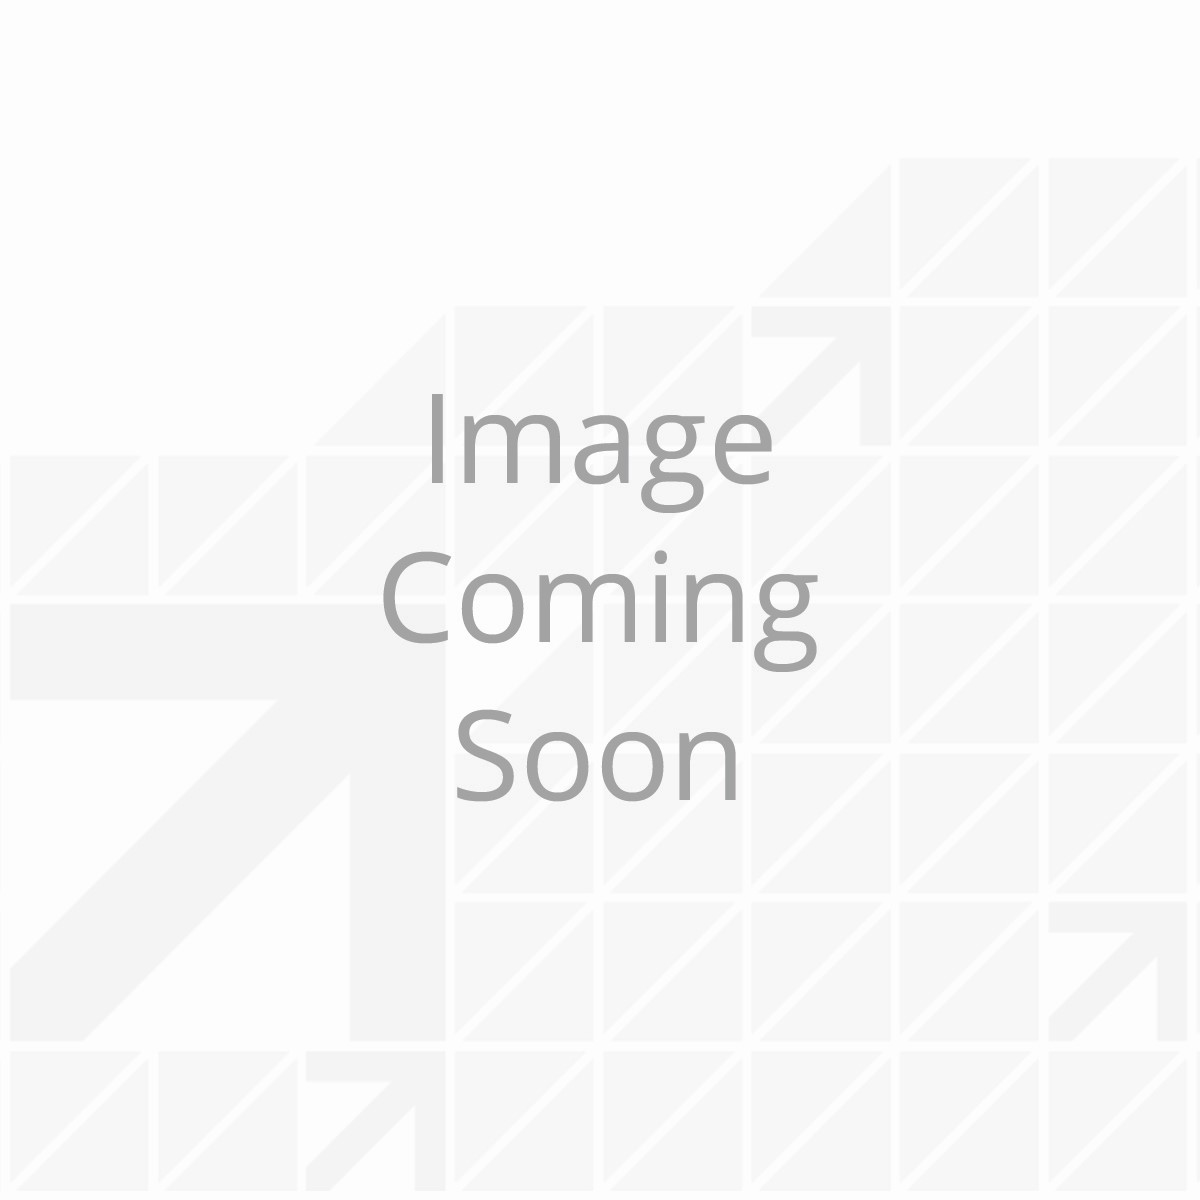 Custom 5th Wheel Brackets, Select Chevrolet Silverado, GMC Sierra 2500, 3500 HD